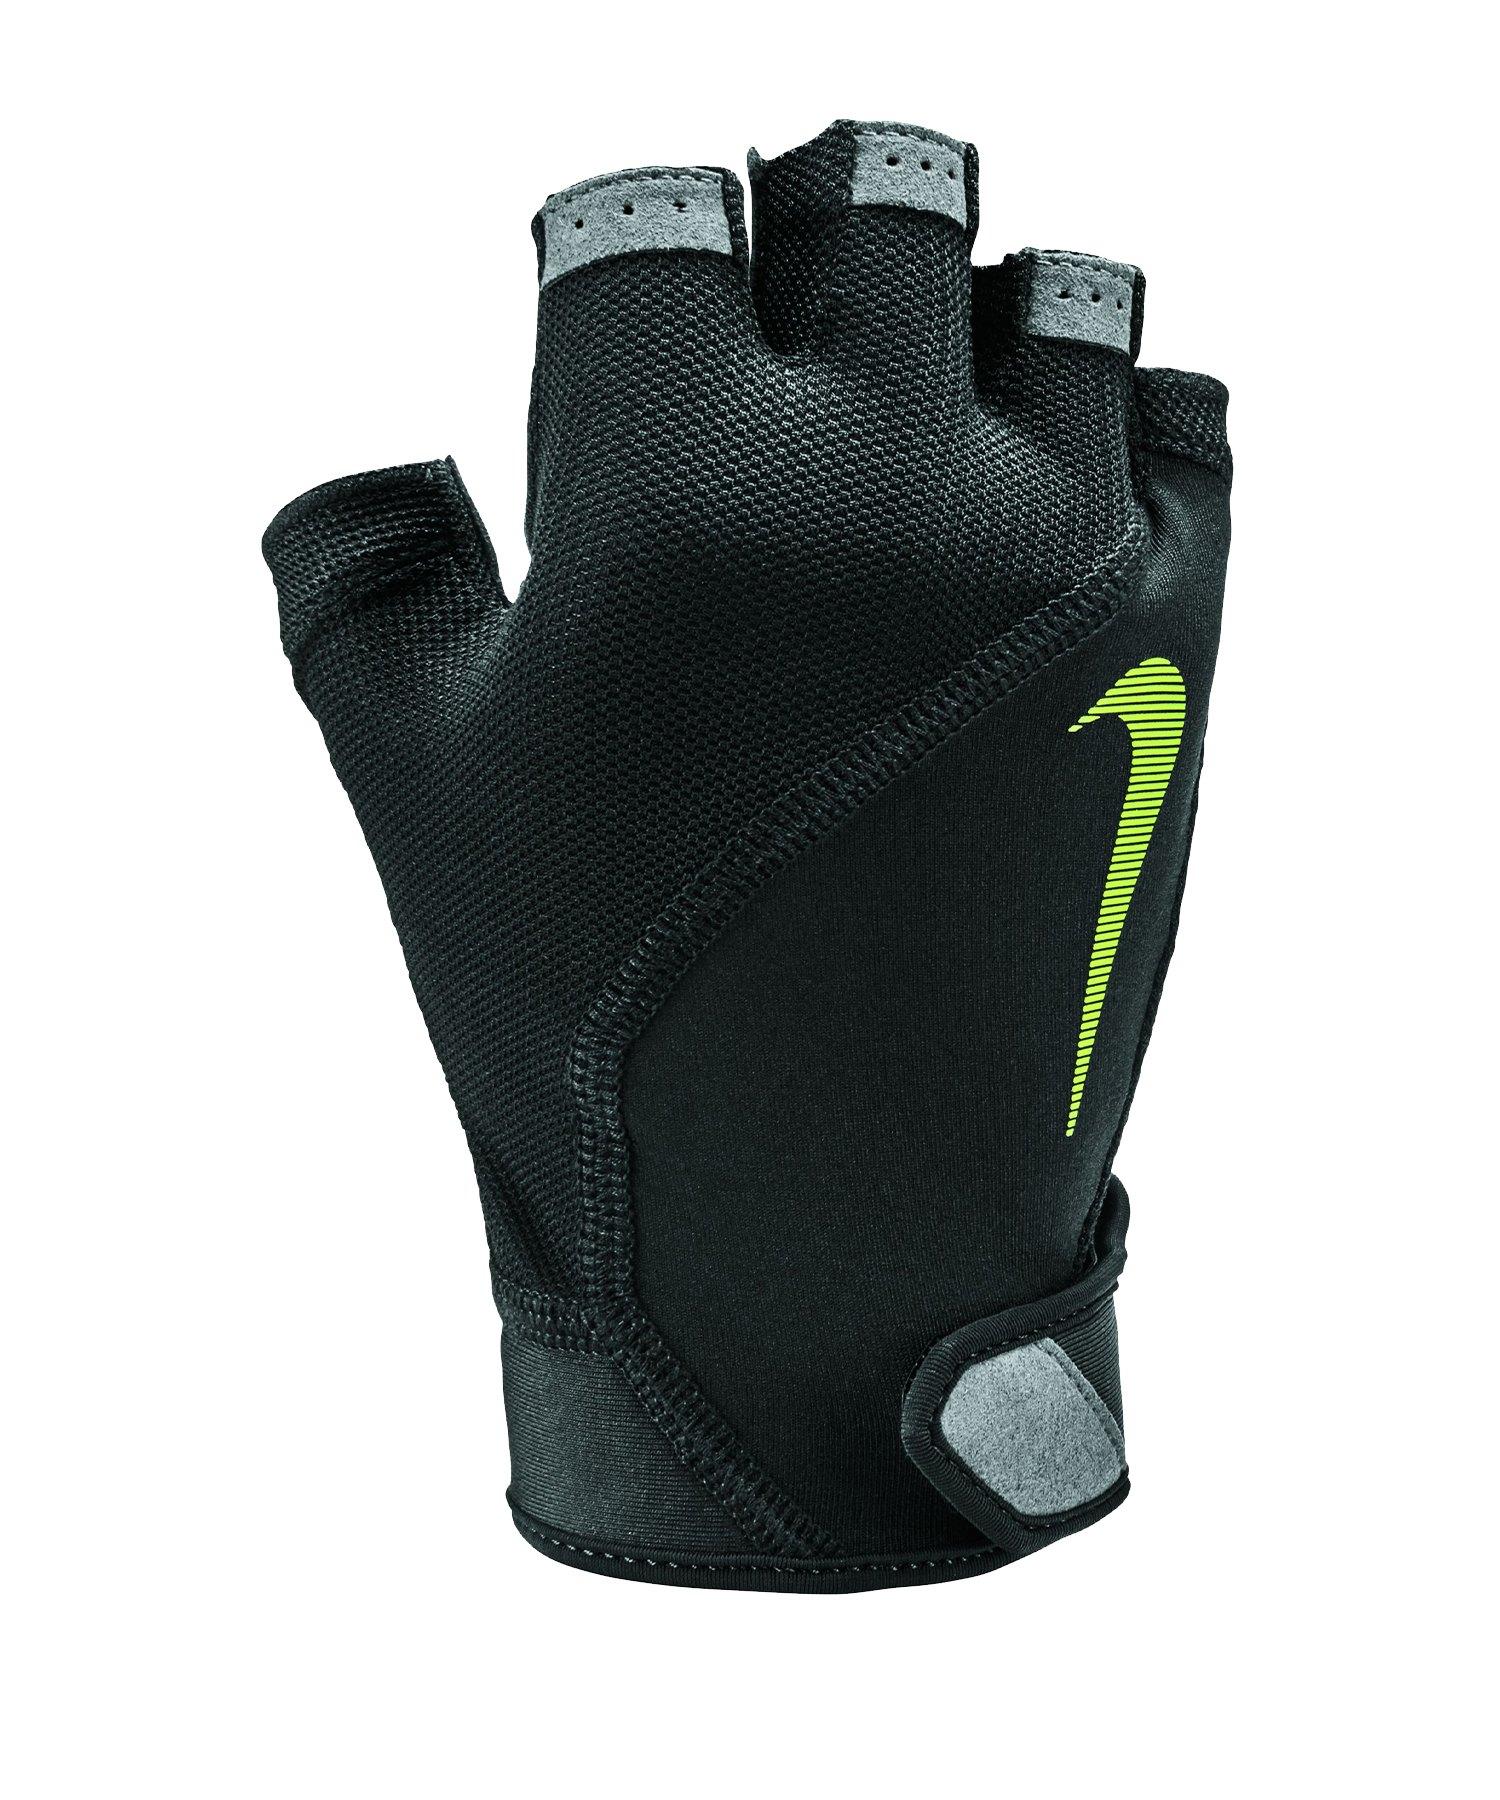 Nike Elemental Fitnesshandschuhe Schwarz F055 - schwarz